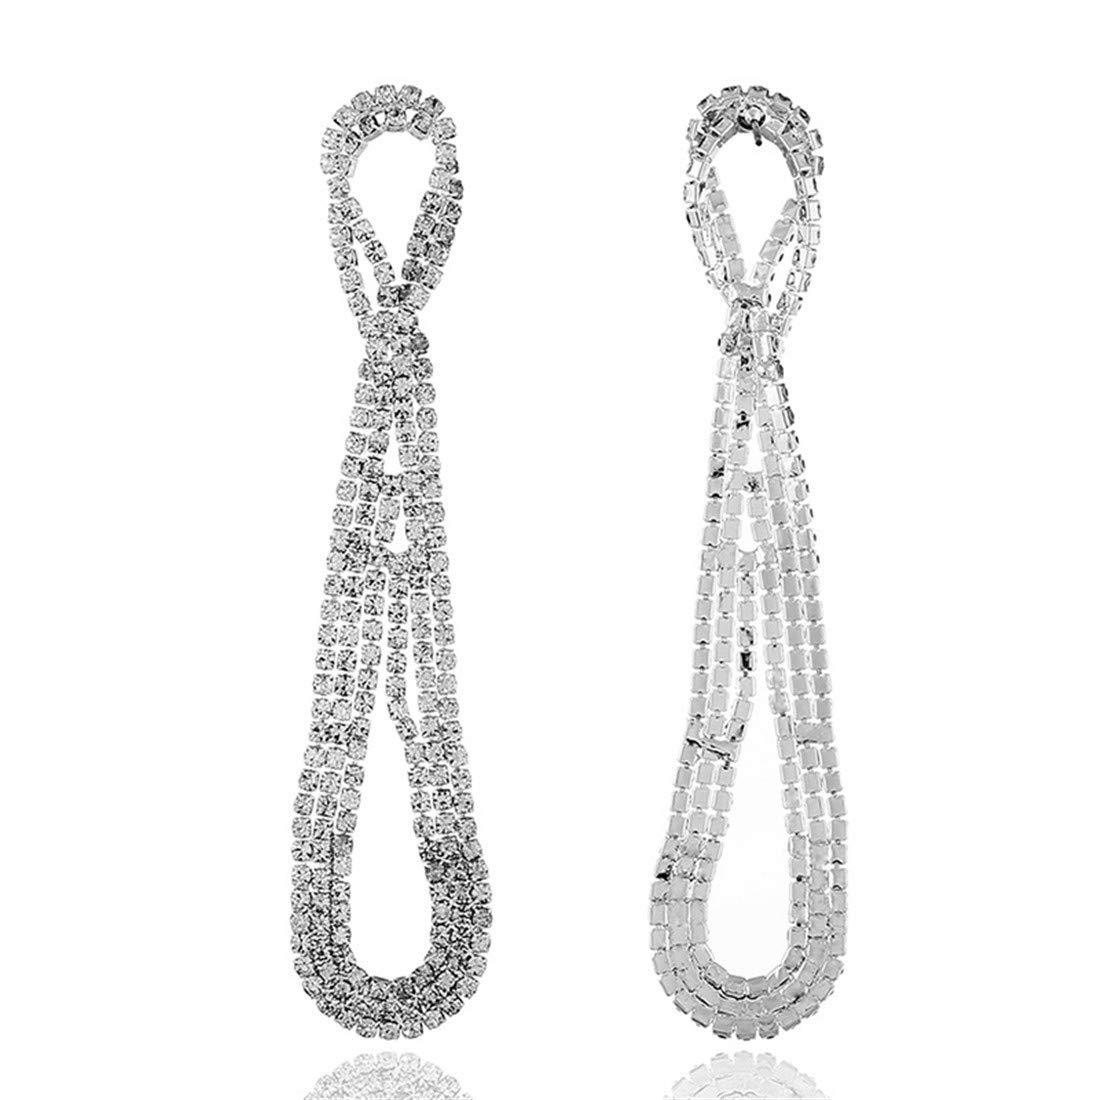 long chain knitted Earrings ball earrings|clip on earrings|ear cuffs|dangle earrings|earring jackets|hoop earrings|stud earrings|European and American diamond drill earrings